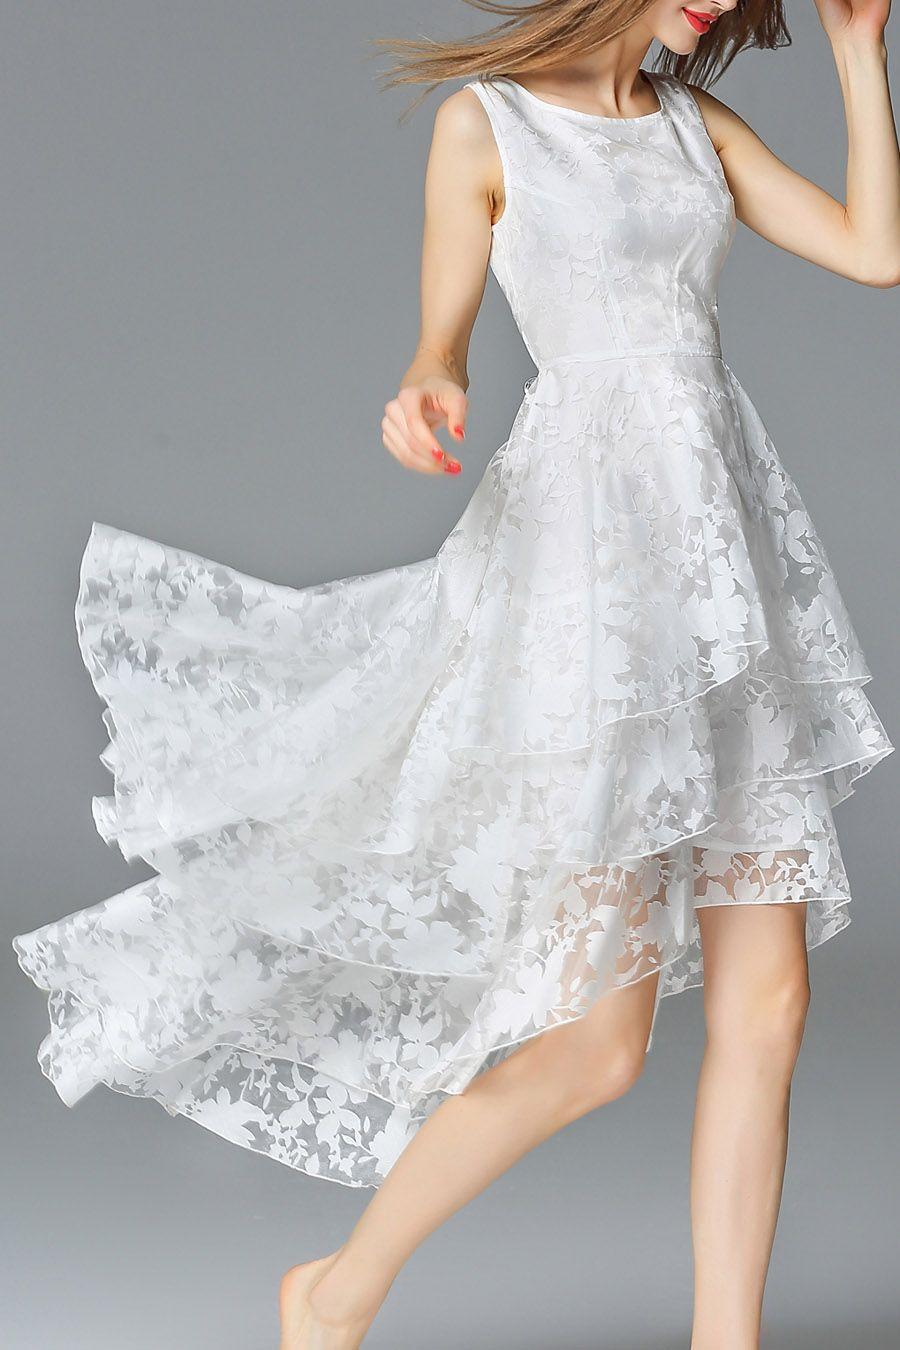 Asymmetric Layered Midi Dress Designer Dresses Online White Bridesmaid Dresses Shop Designer Dresses [ 1350 x 900 Pixel ]